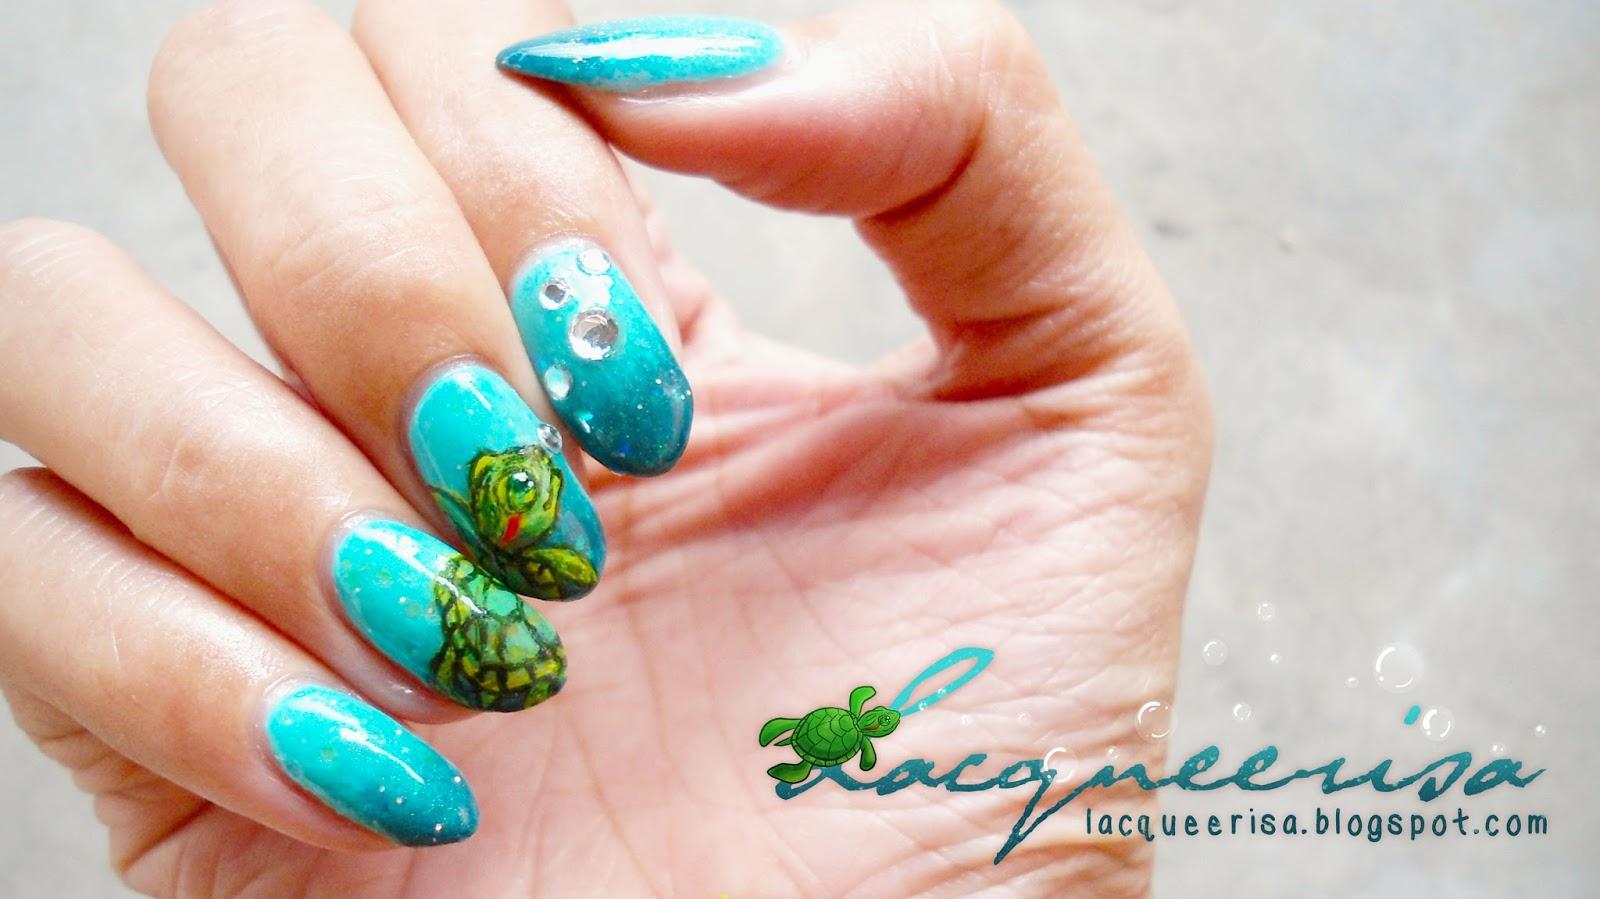 Bubbles and A Turtle lacqueerisa.blogspot.com